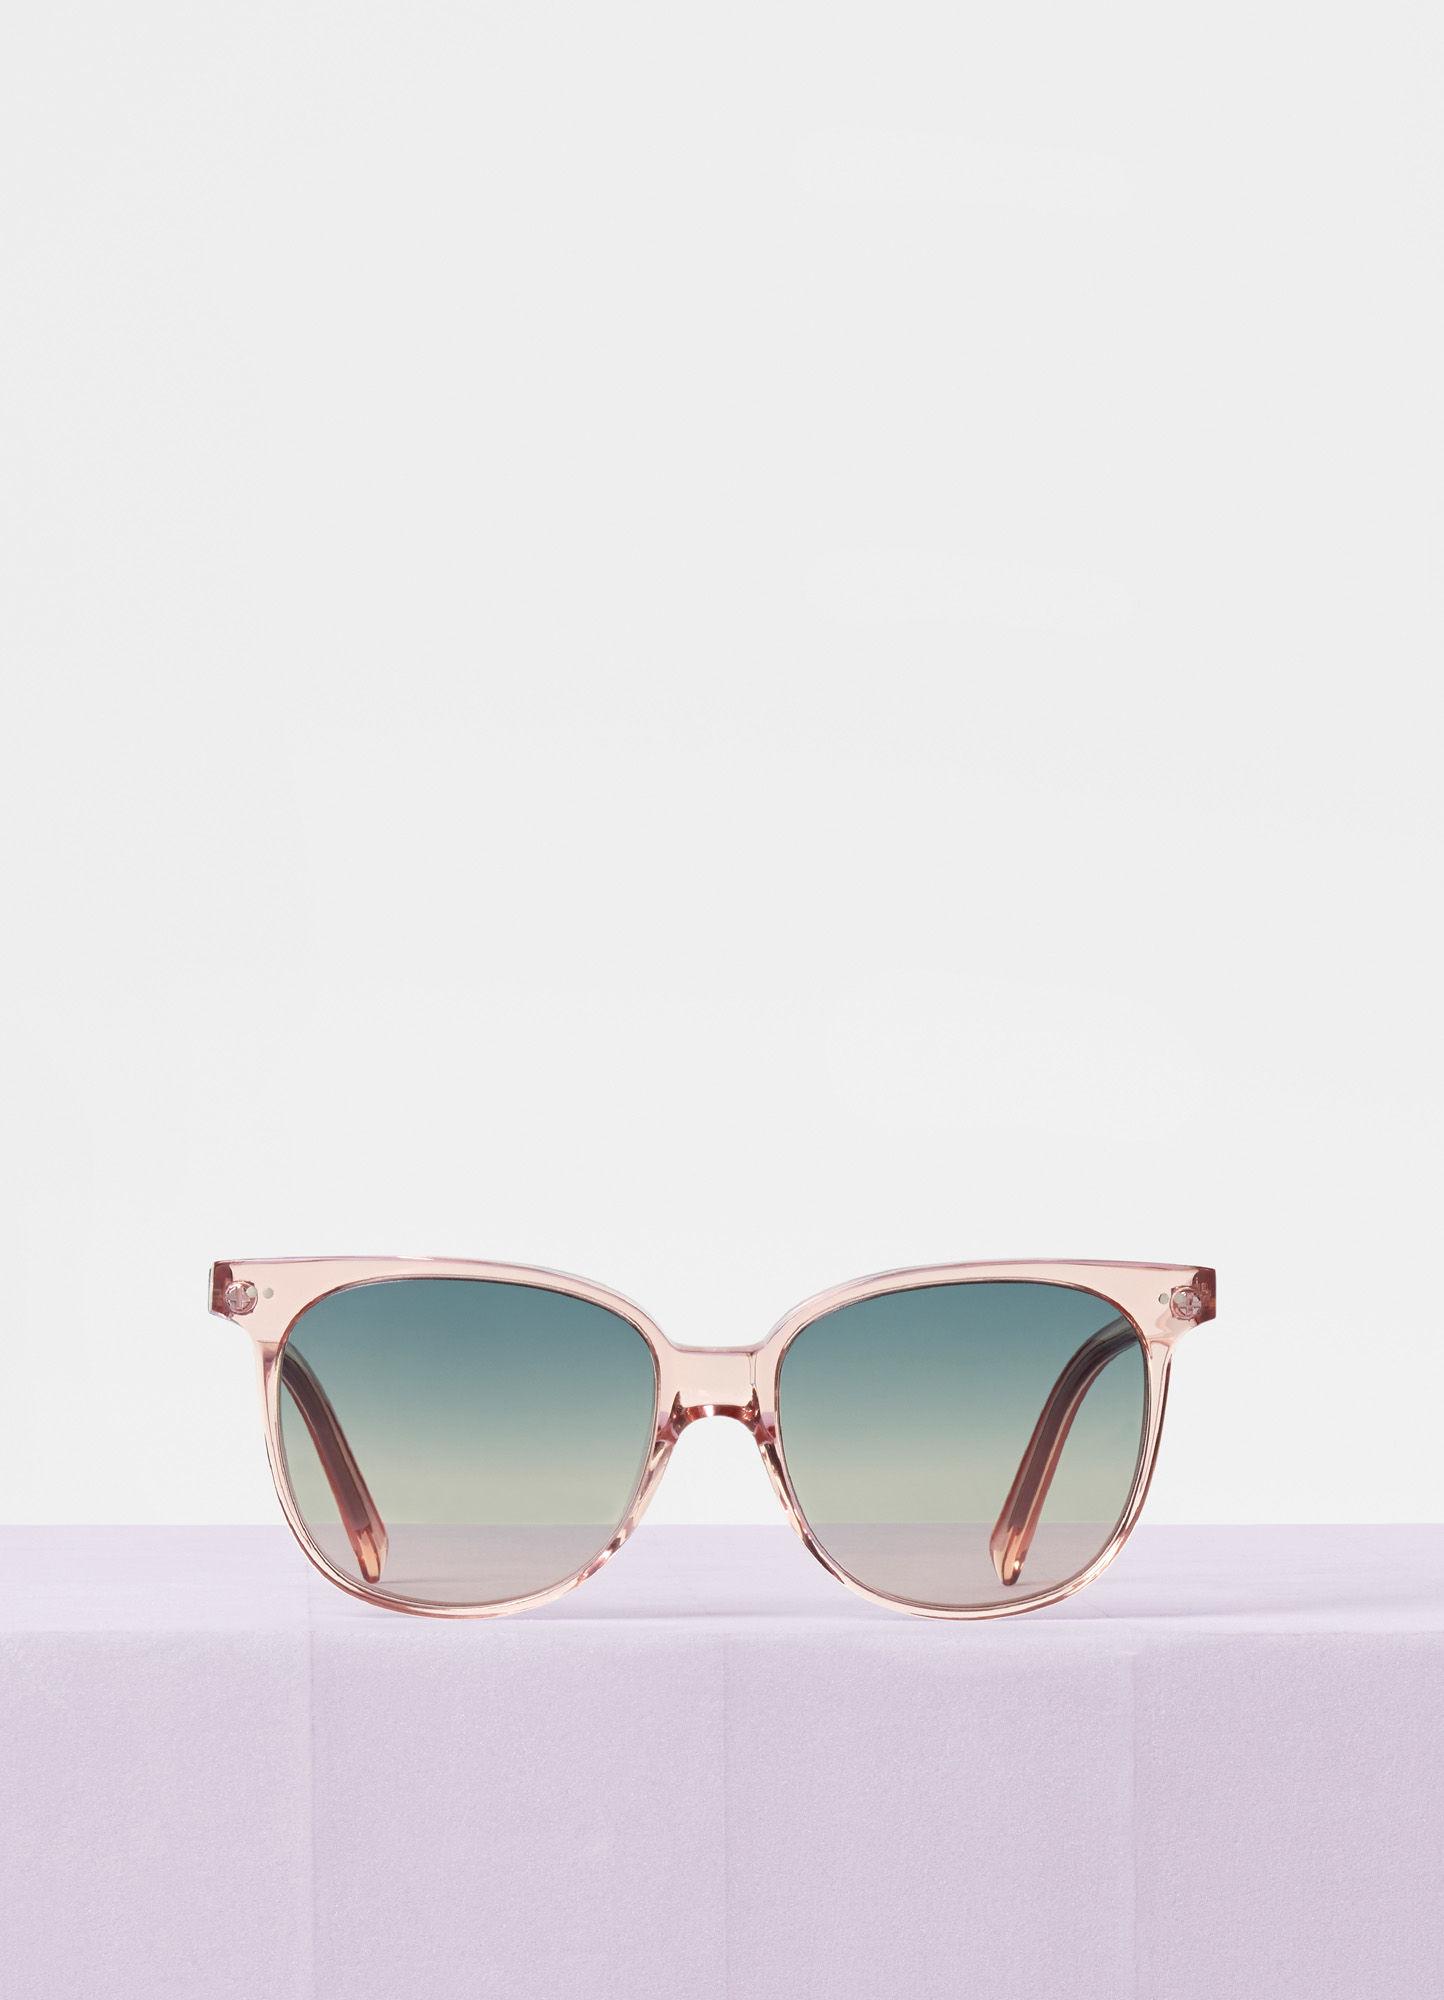 CELINE- CL400221 Sunglasses  £250 (Sold out)  COLOUR: Transparent Pink  CATEGORY SUN  MATERIAL Acetate  SHAPE Oversized